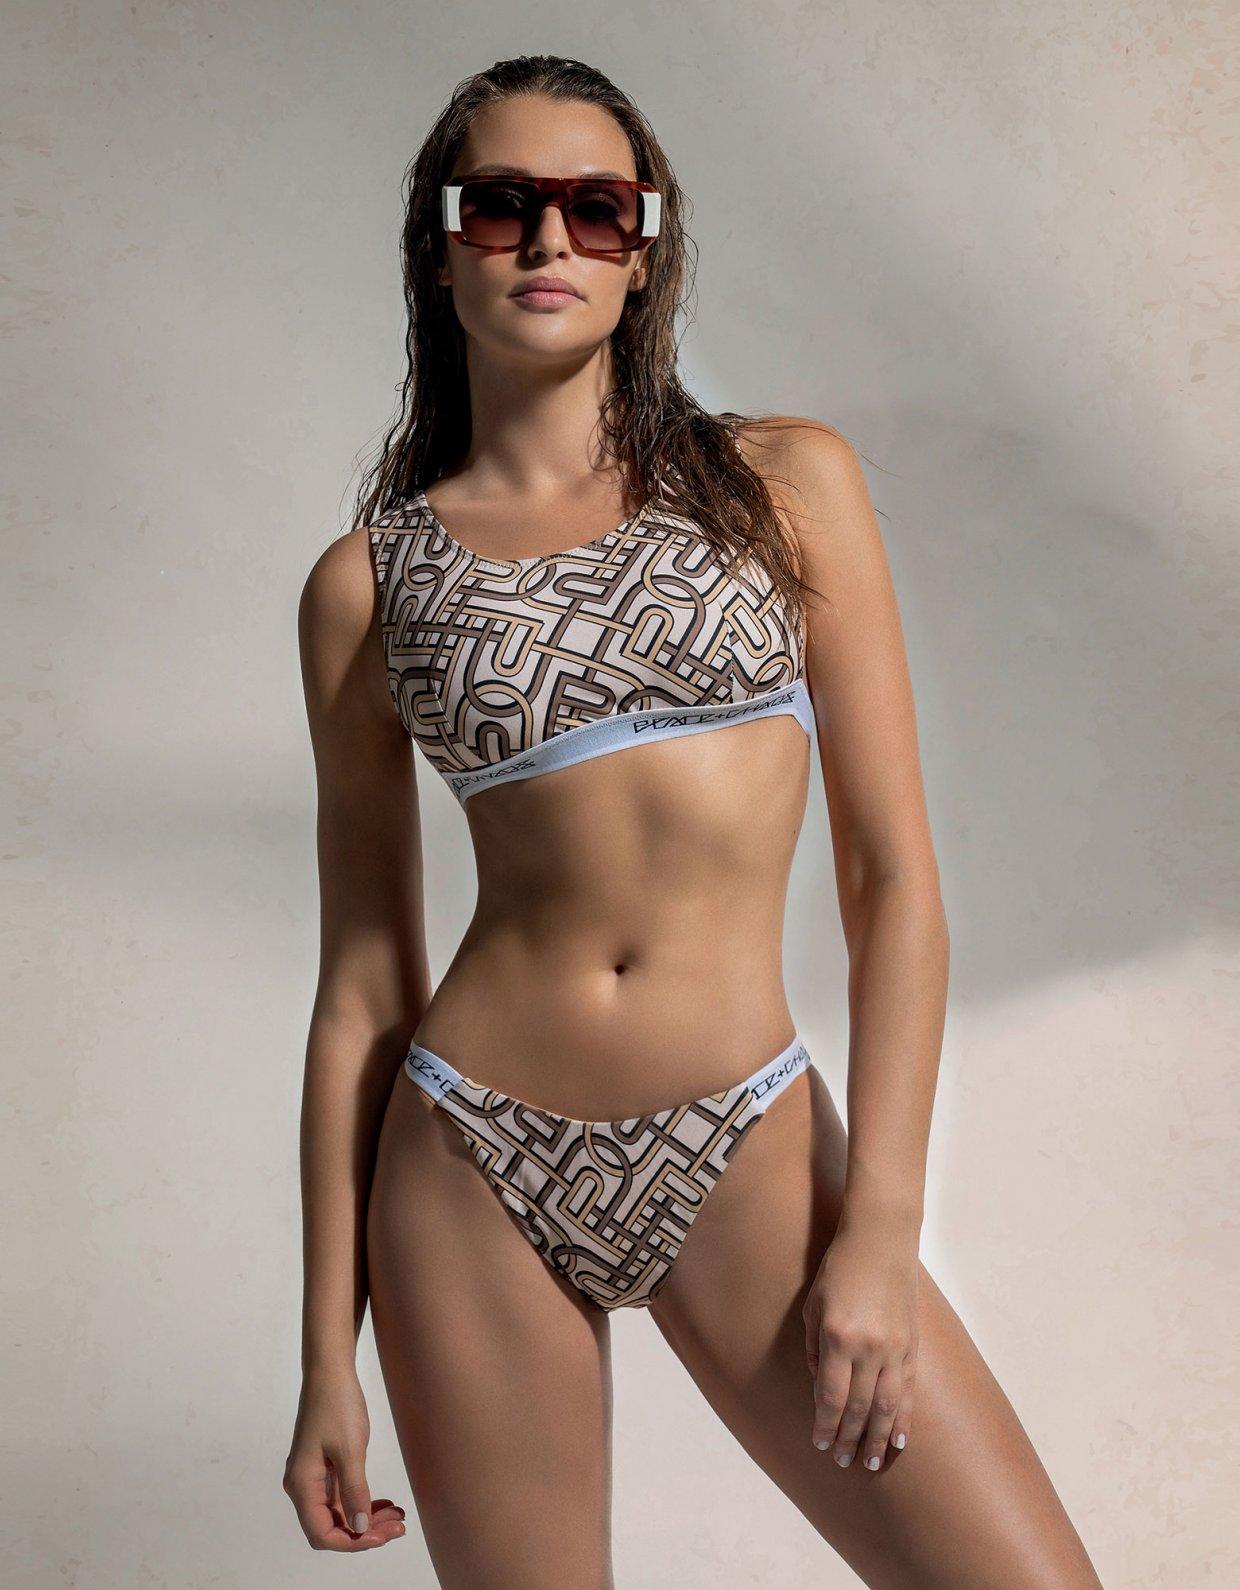 Peace & Chaos P&C pattern bikini